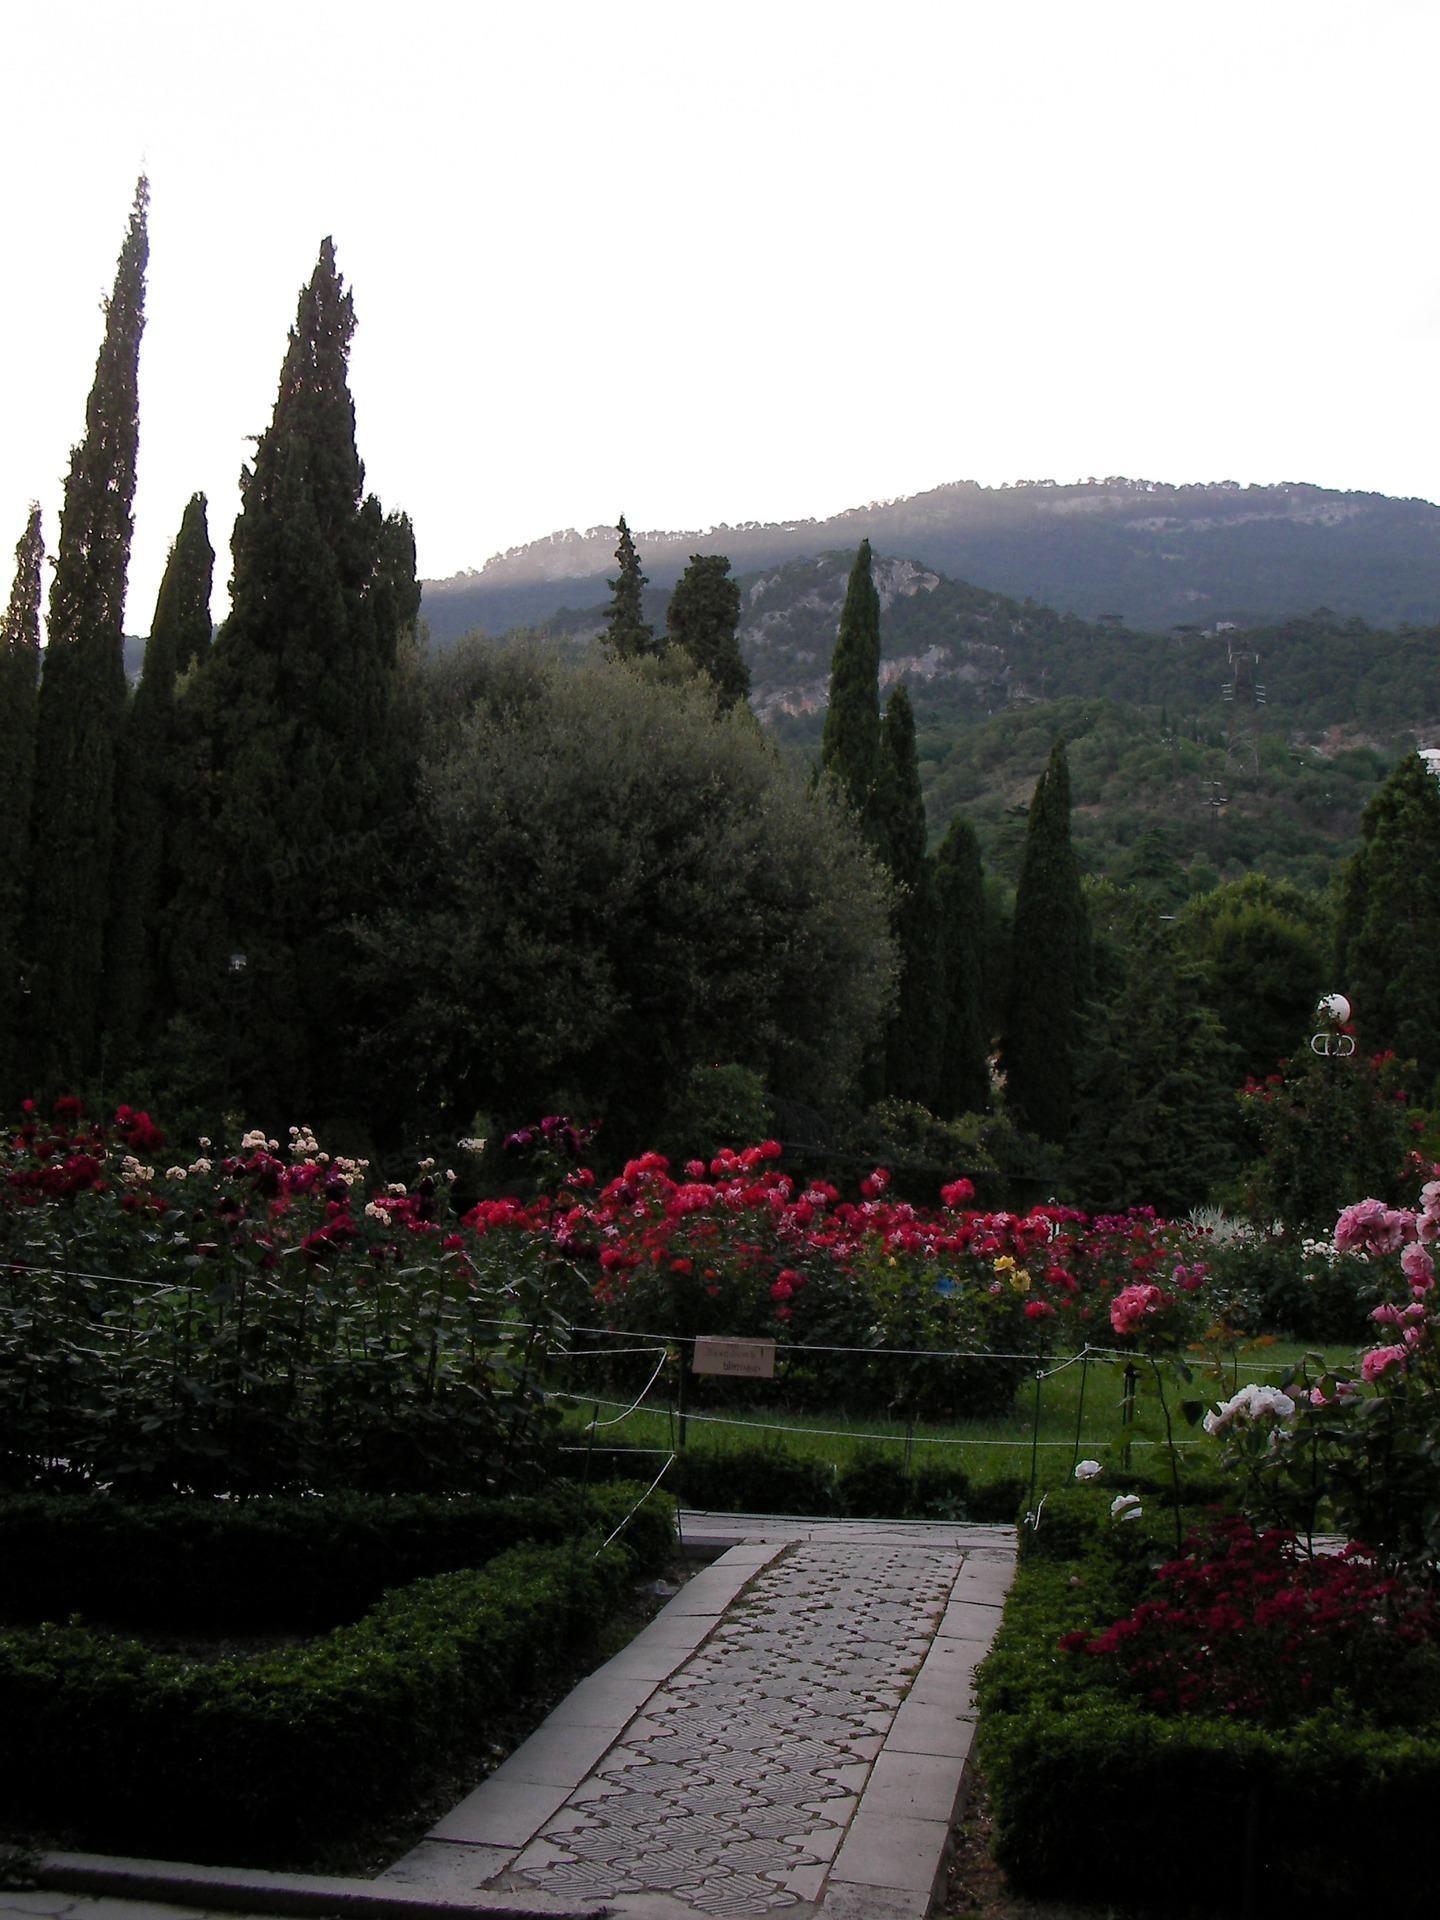 Rose Garden and the mountains